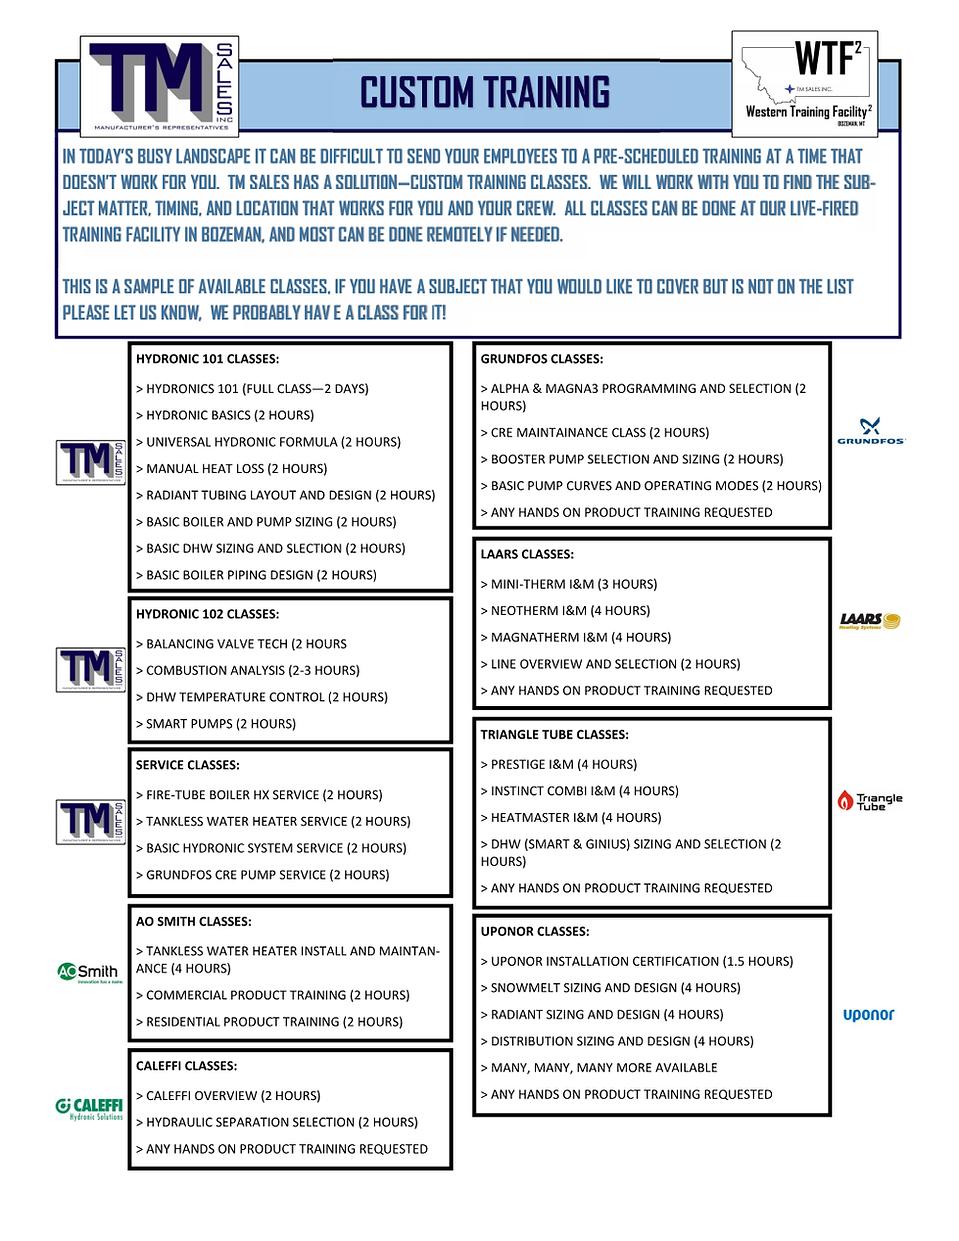 TM Sales Custom Training Menu.png